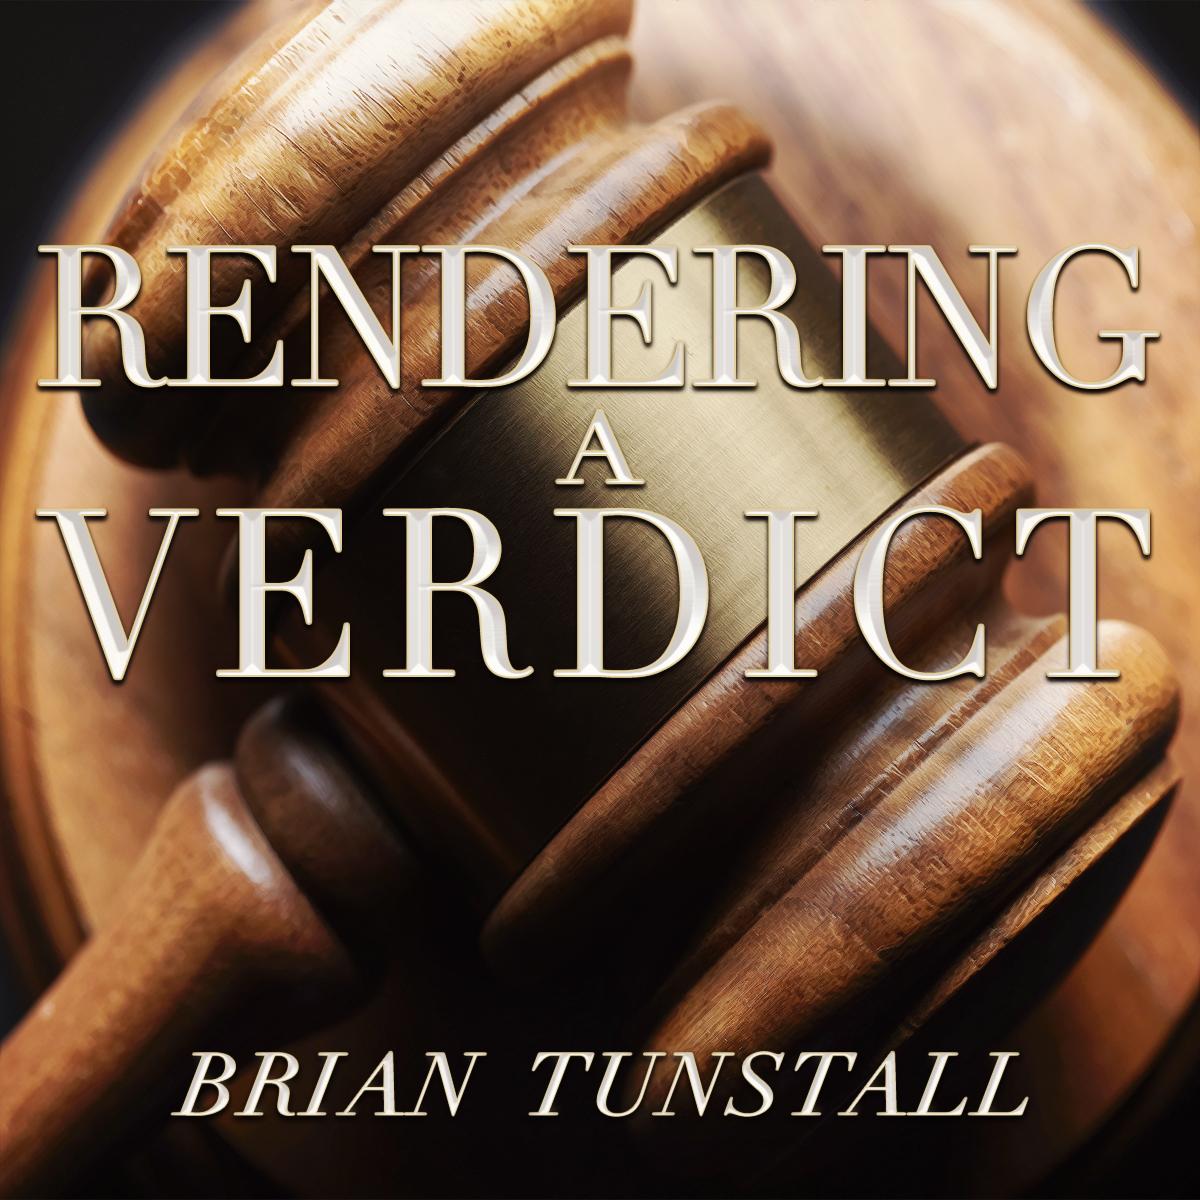 Rendering A Verdict_Cover